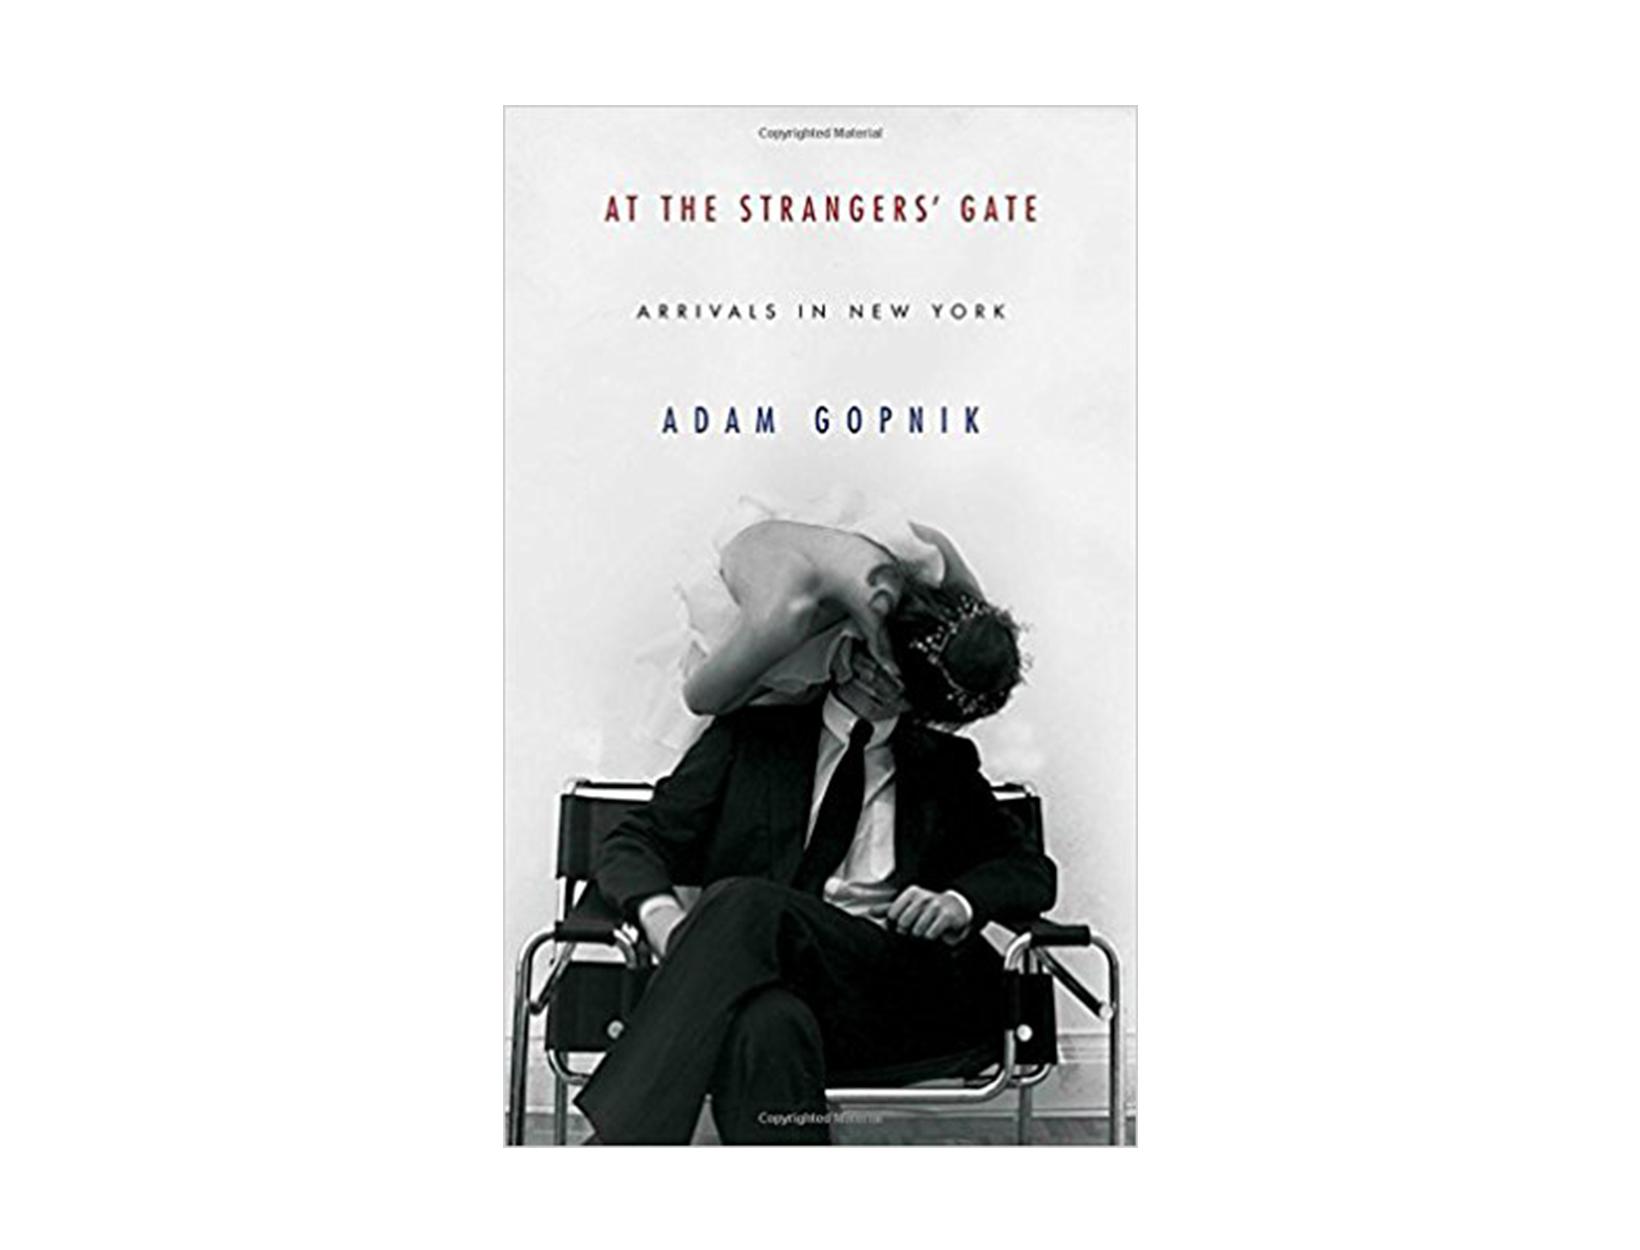 At the Stranger's Gate by Adam Gopnik